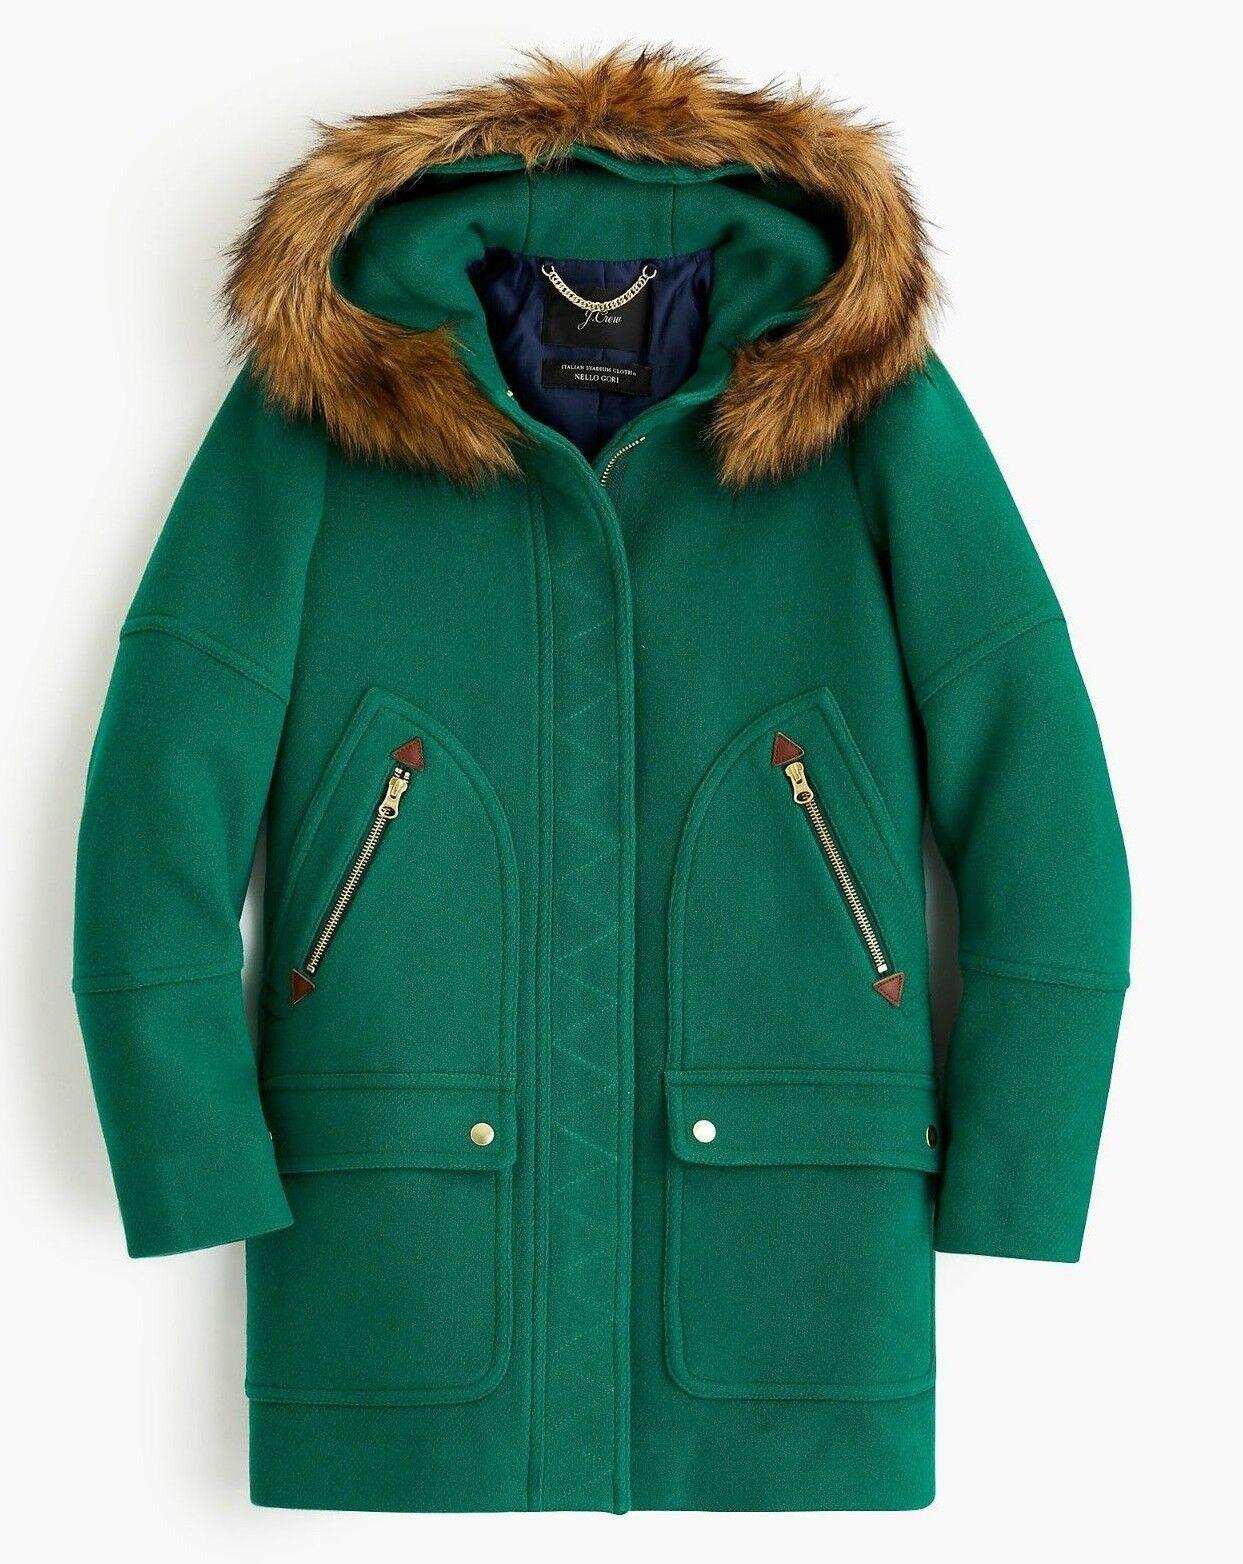 NWT JCrew  Chateau Parka in Italian Stadium-Cloth Wool 6 ALPINE  J5488 Coat